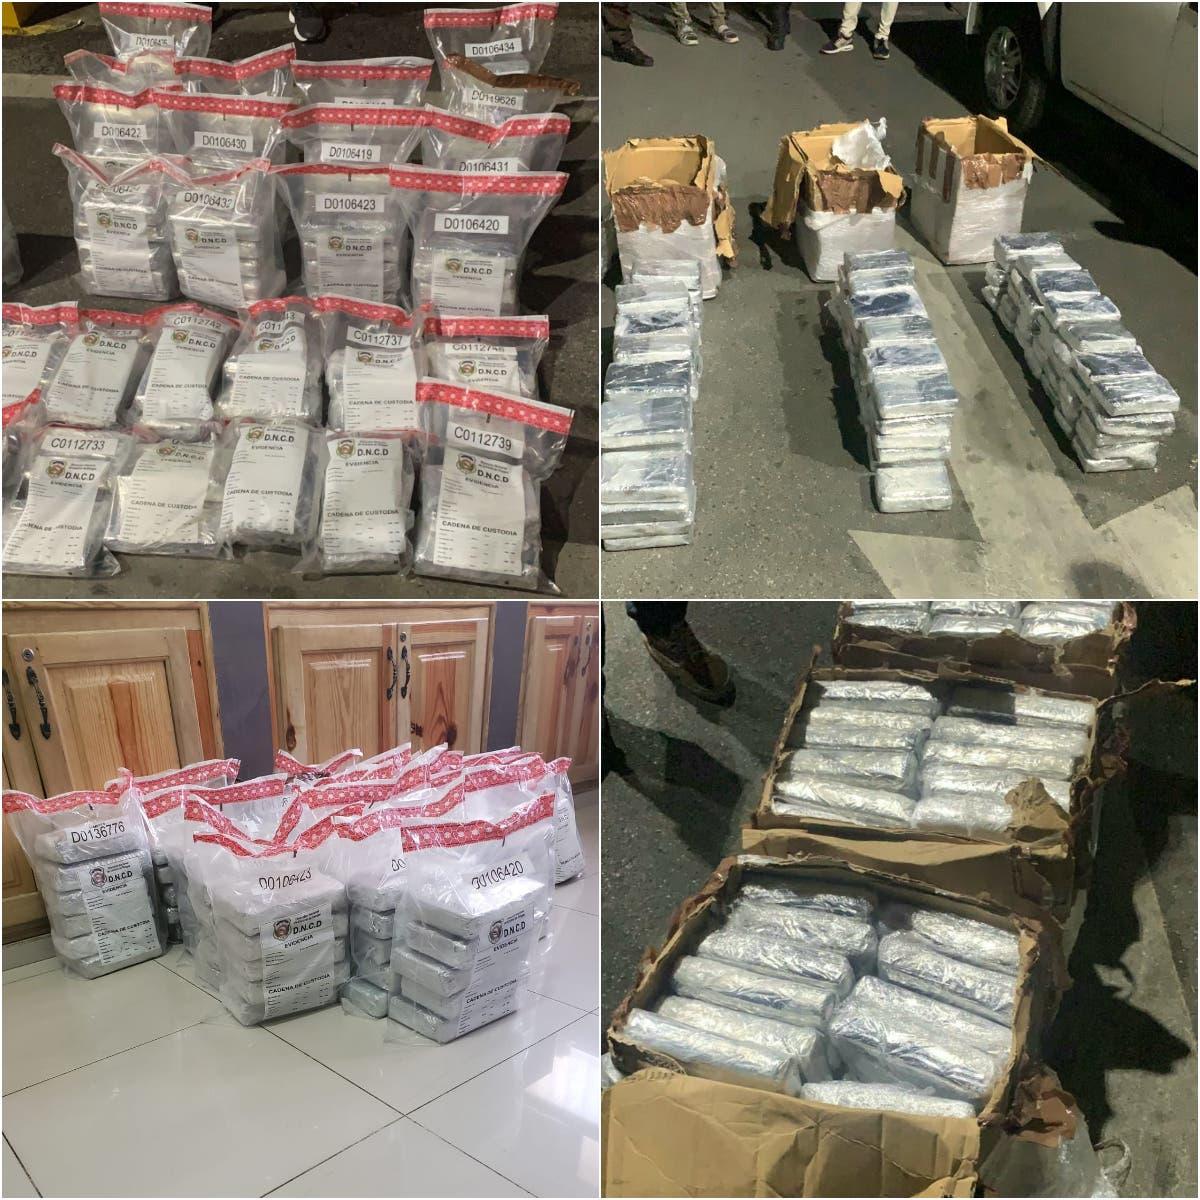 Apresan tres y ocupan 100 paquetes de cocaína en Puerto de Haina